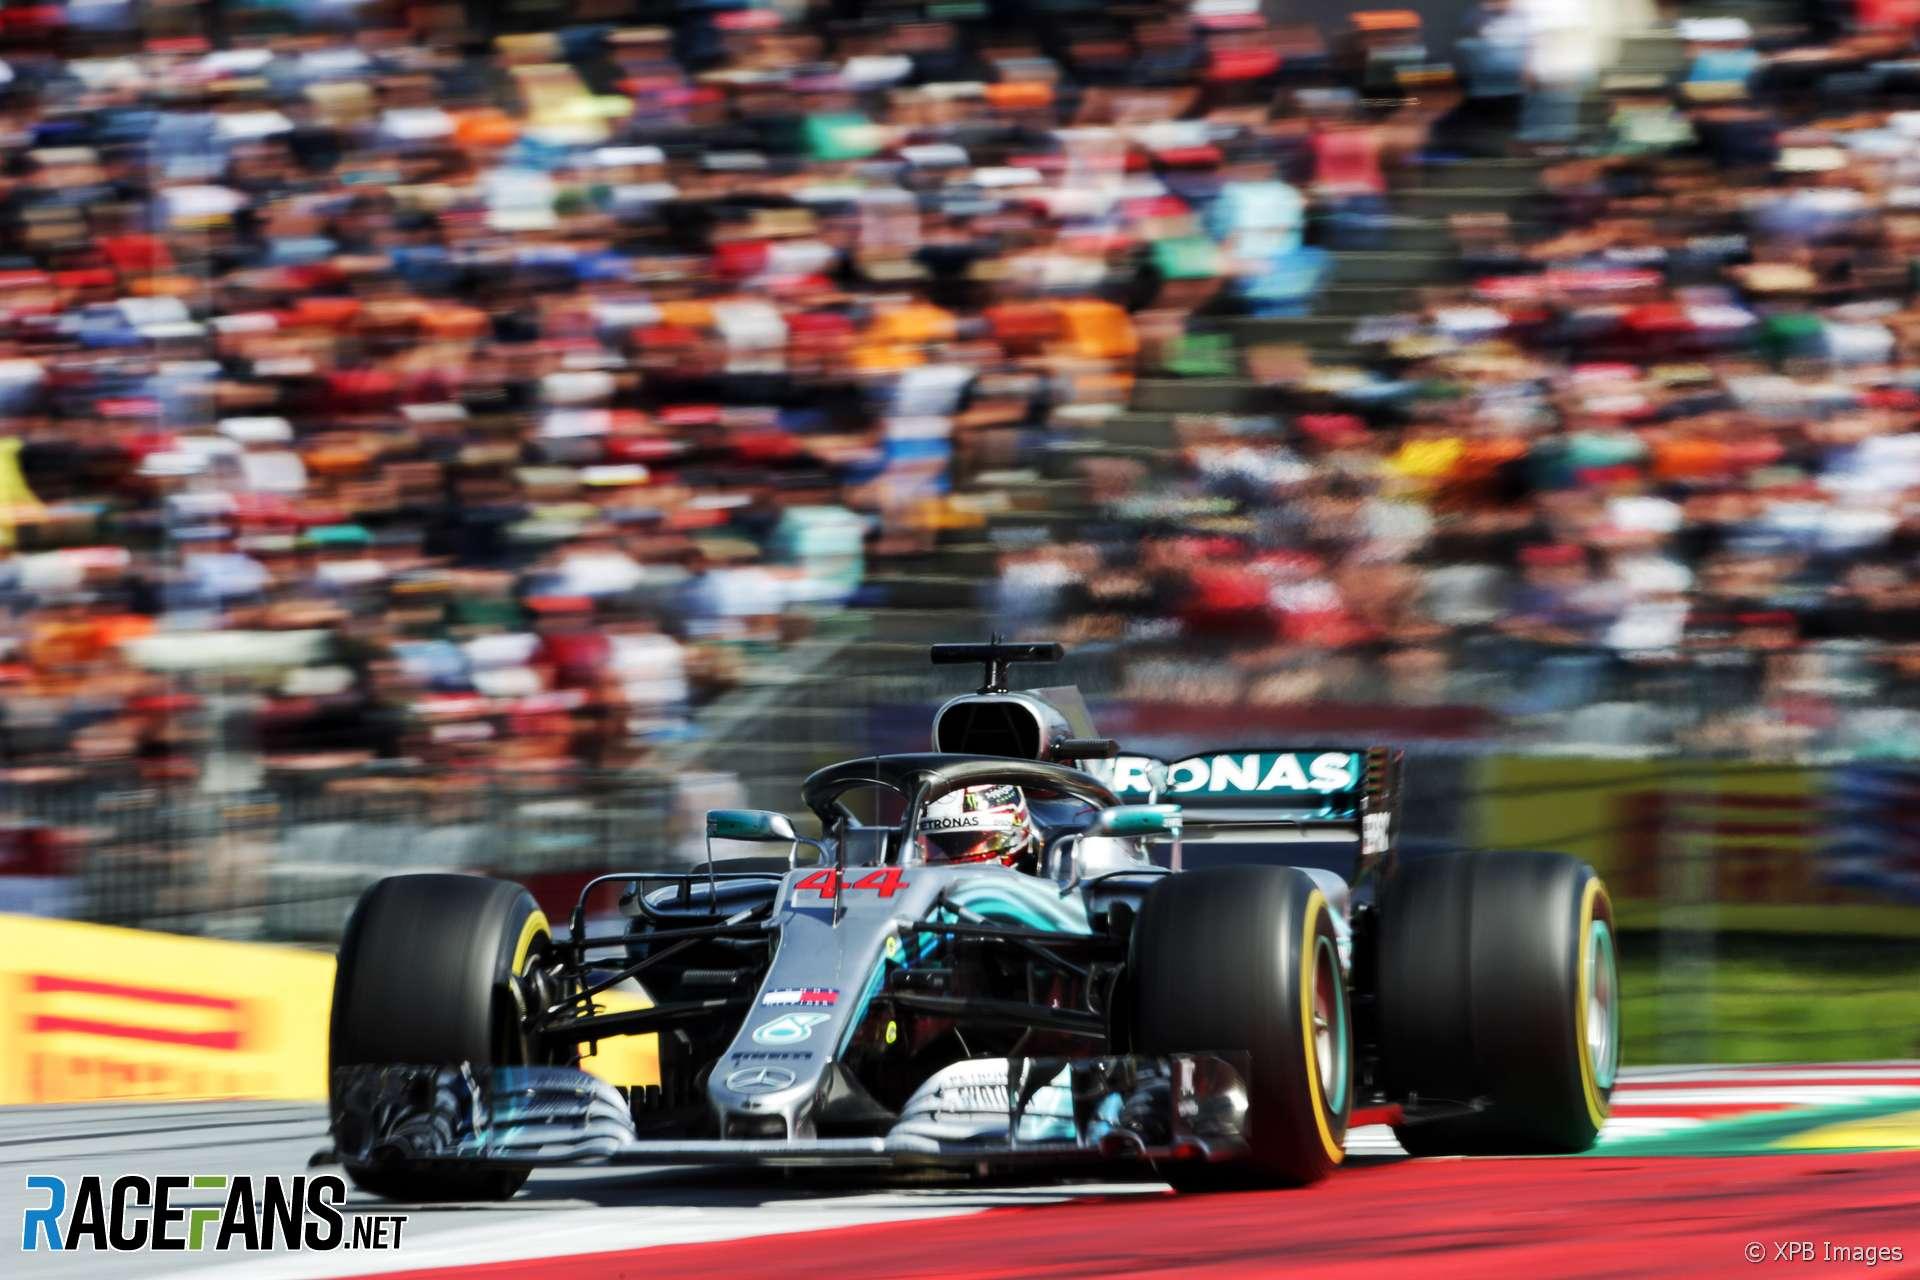 Lewis Hamilton, Mercedes, Red Bull Ring, 2018